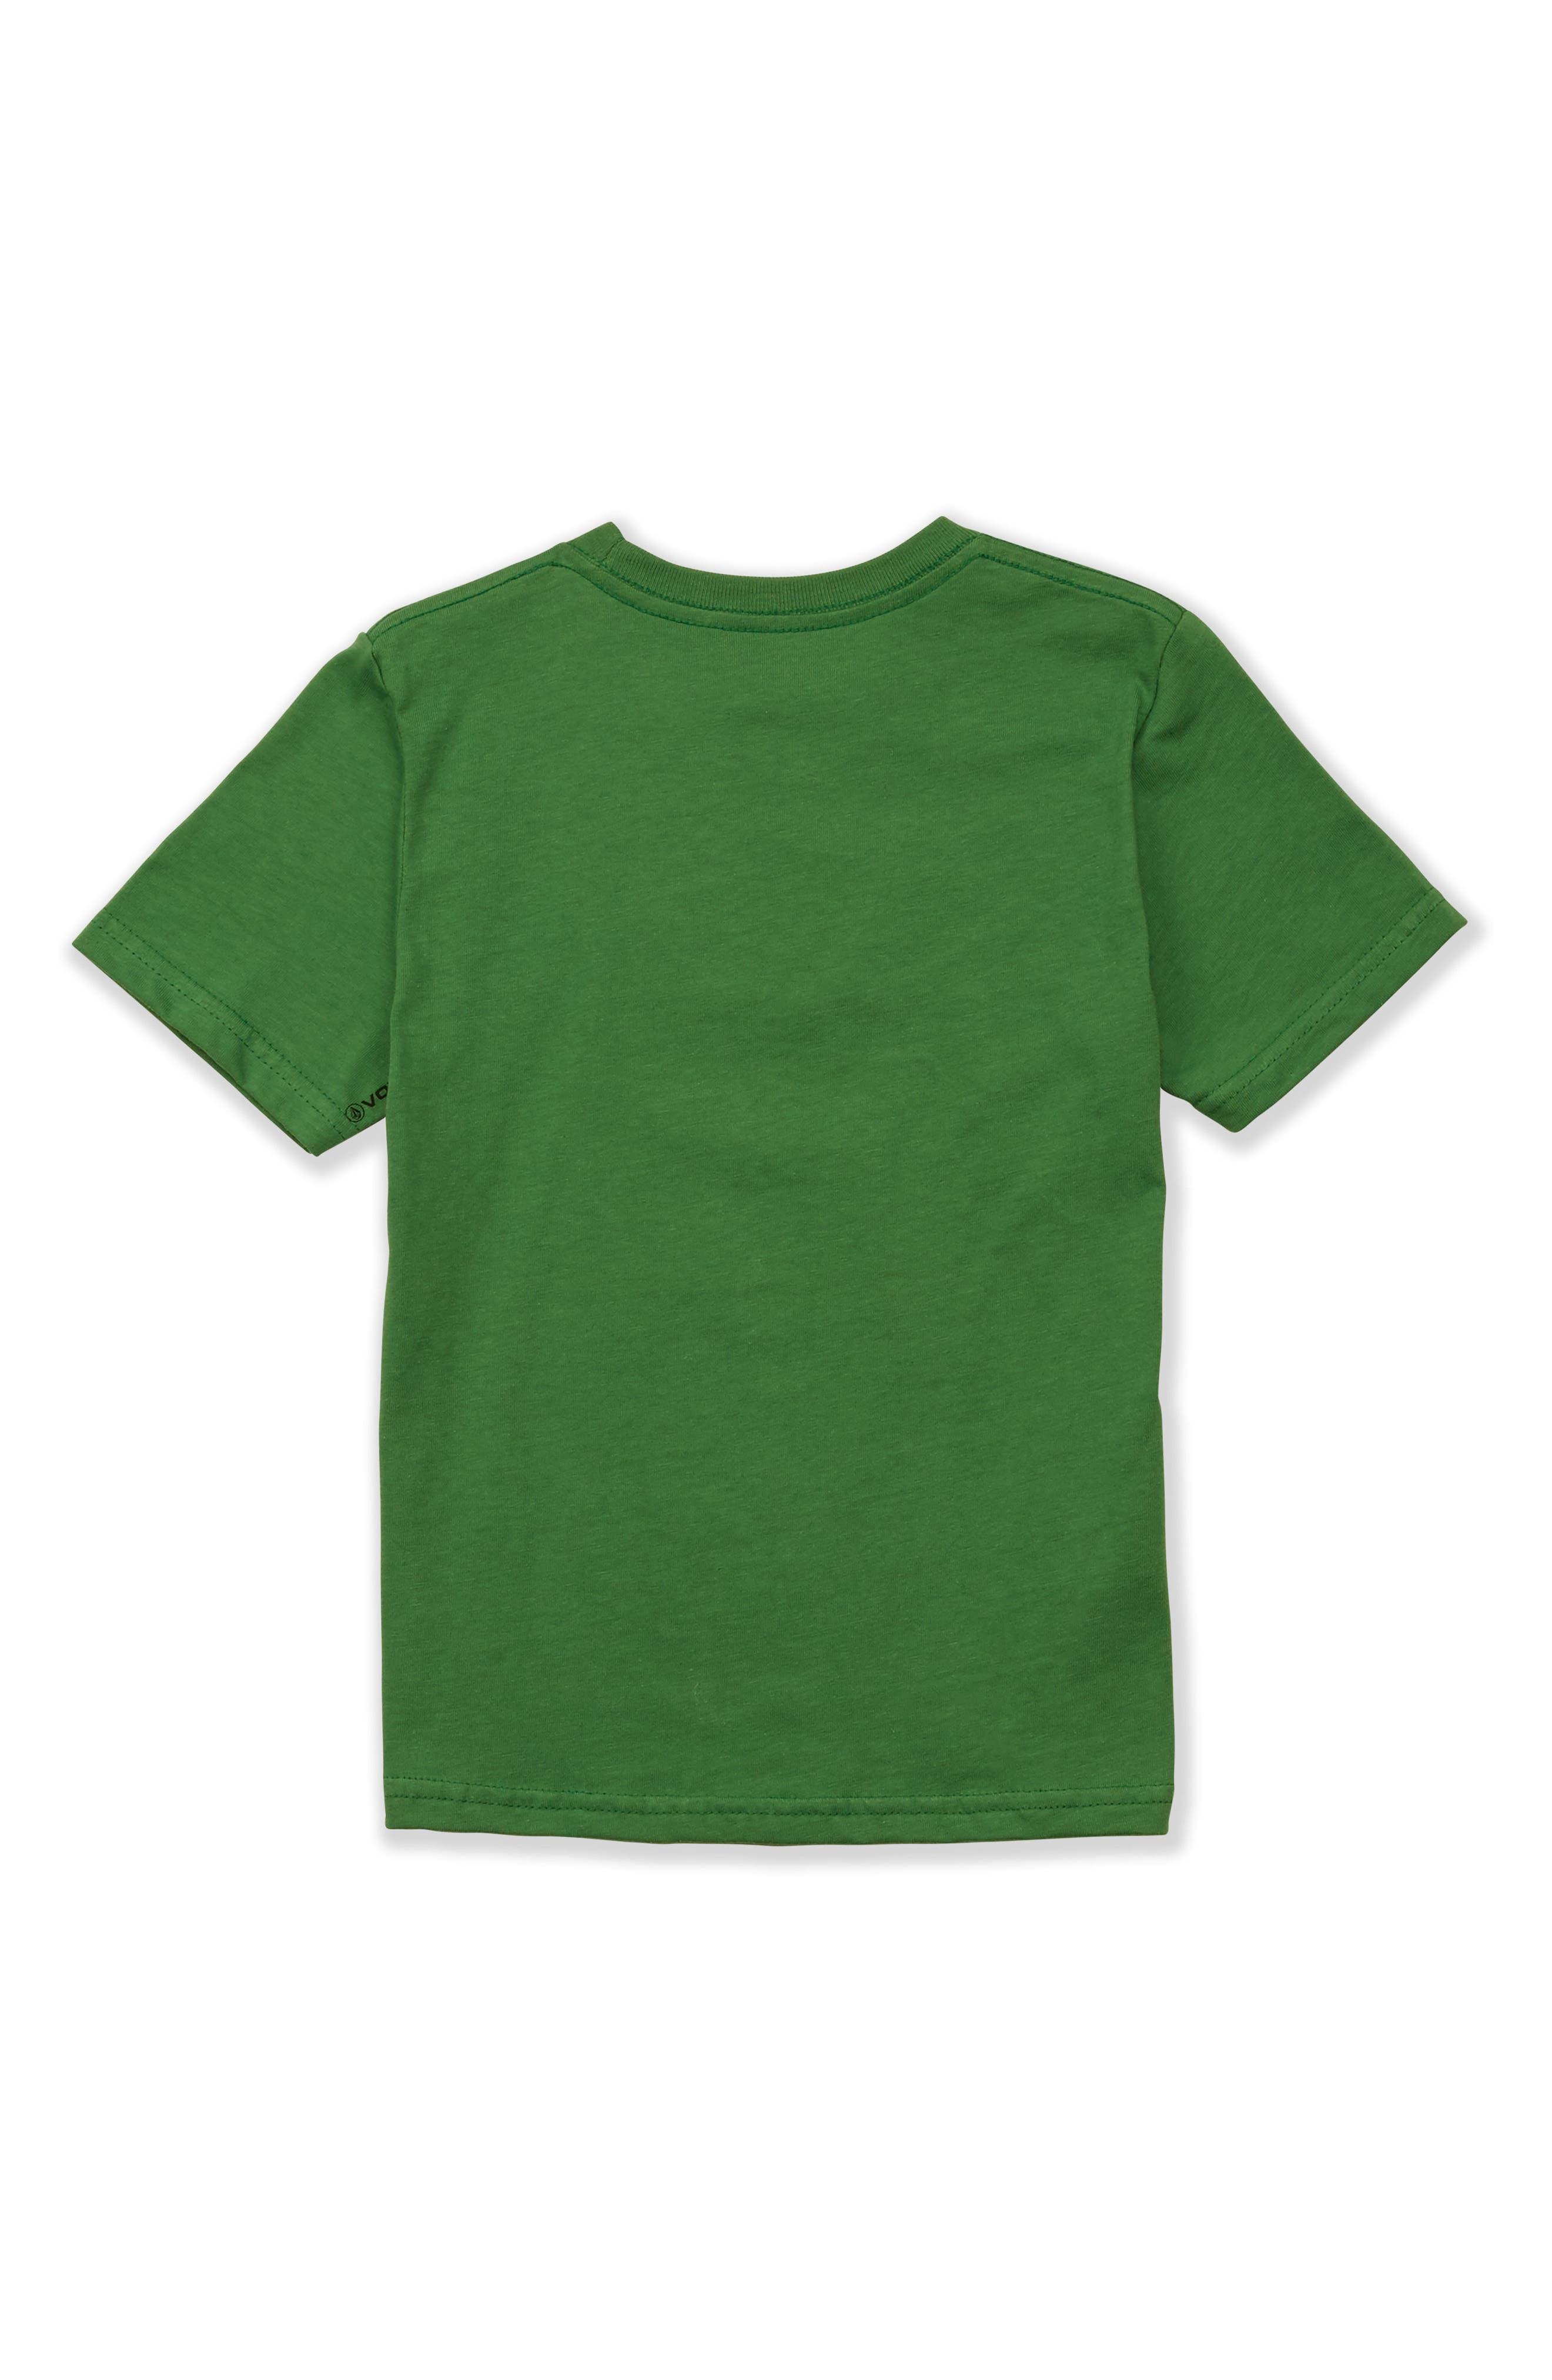 Boltz Logo Graphic T-Shirt,                             Alternate thumbnail 2, color,                             367